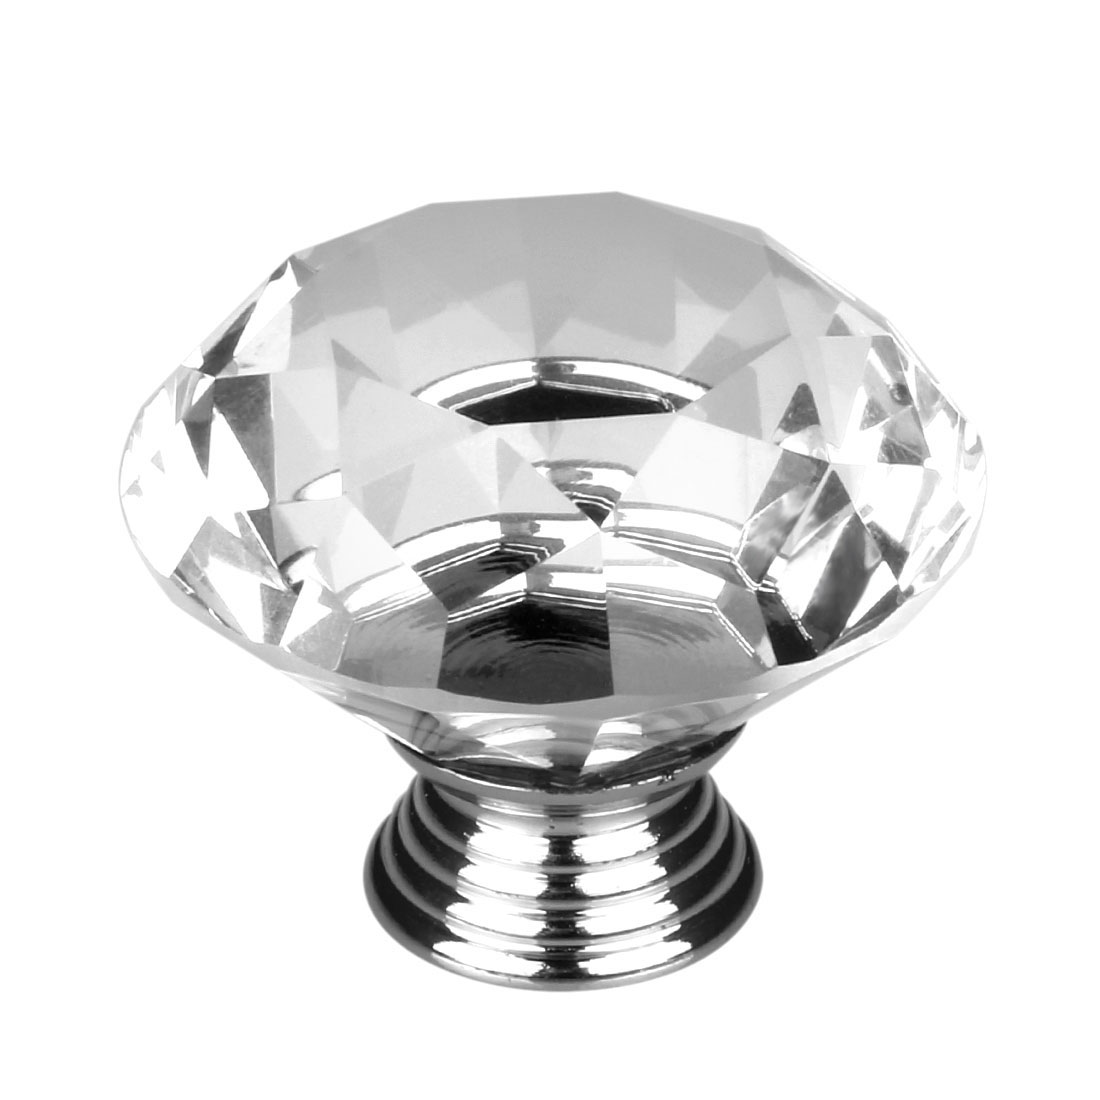 Clear Diamond Crystal Glass Door Knobs Cupboard Drawer Cabinet Kitchen Handles 1